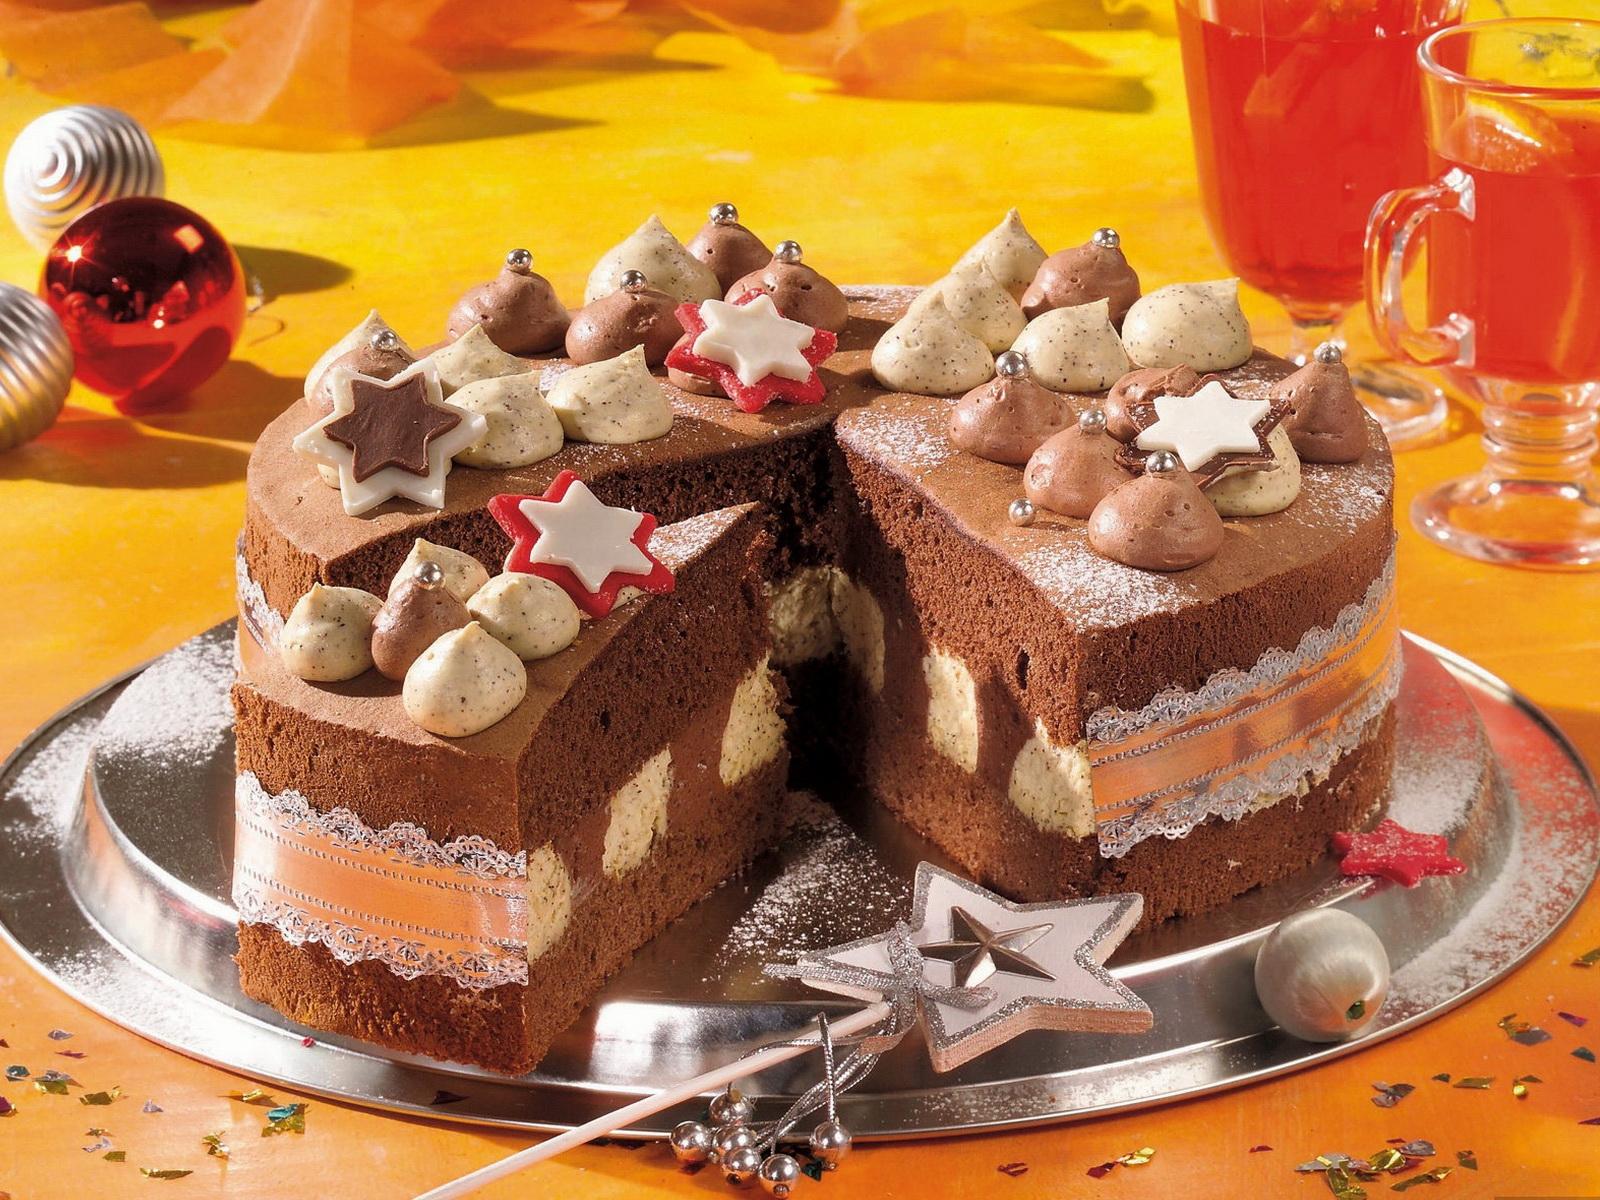 Cobertura de Chocolift   Sobremesa, Bolo de chocolate